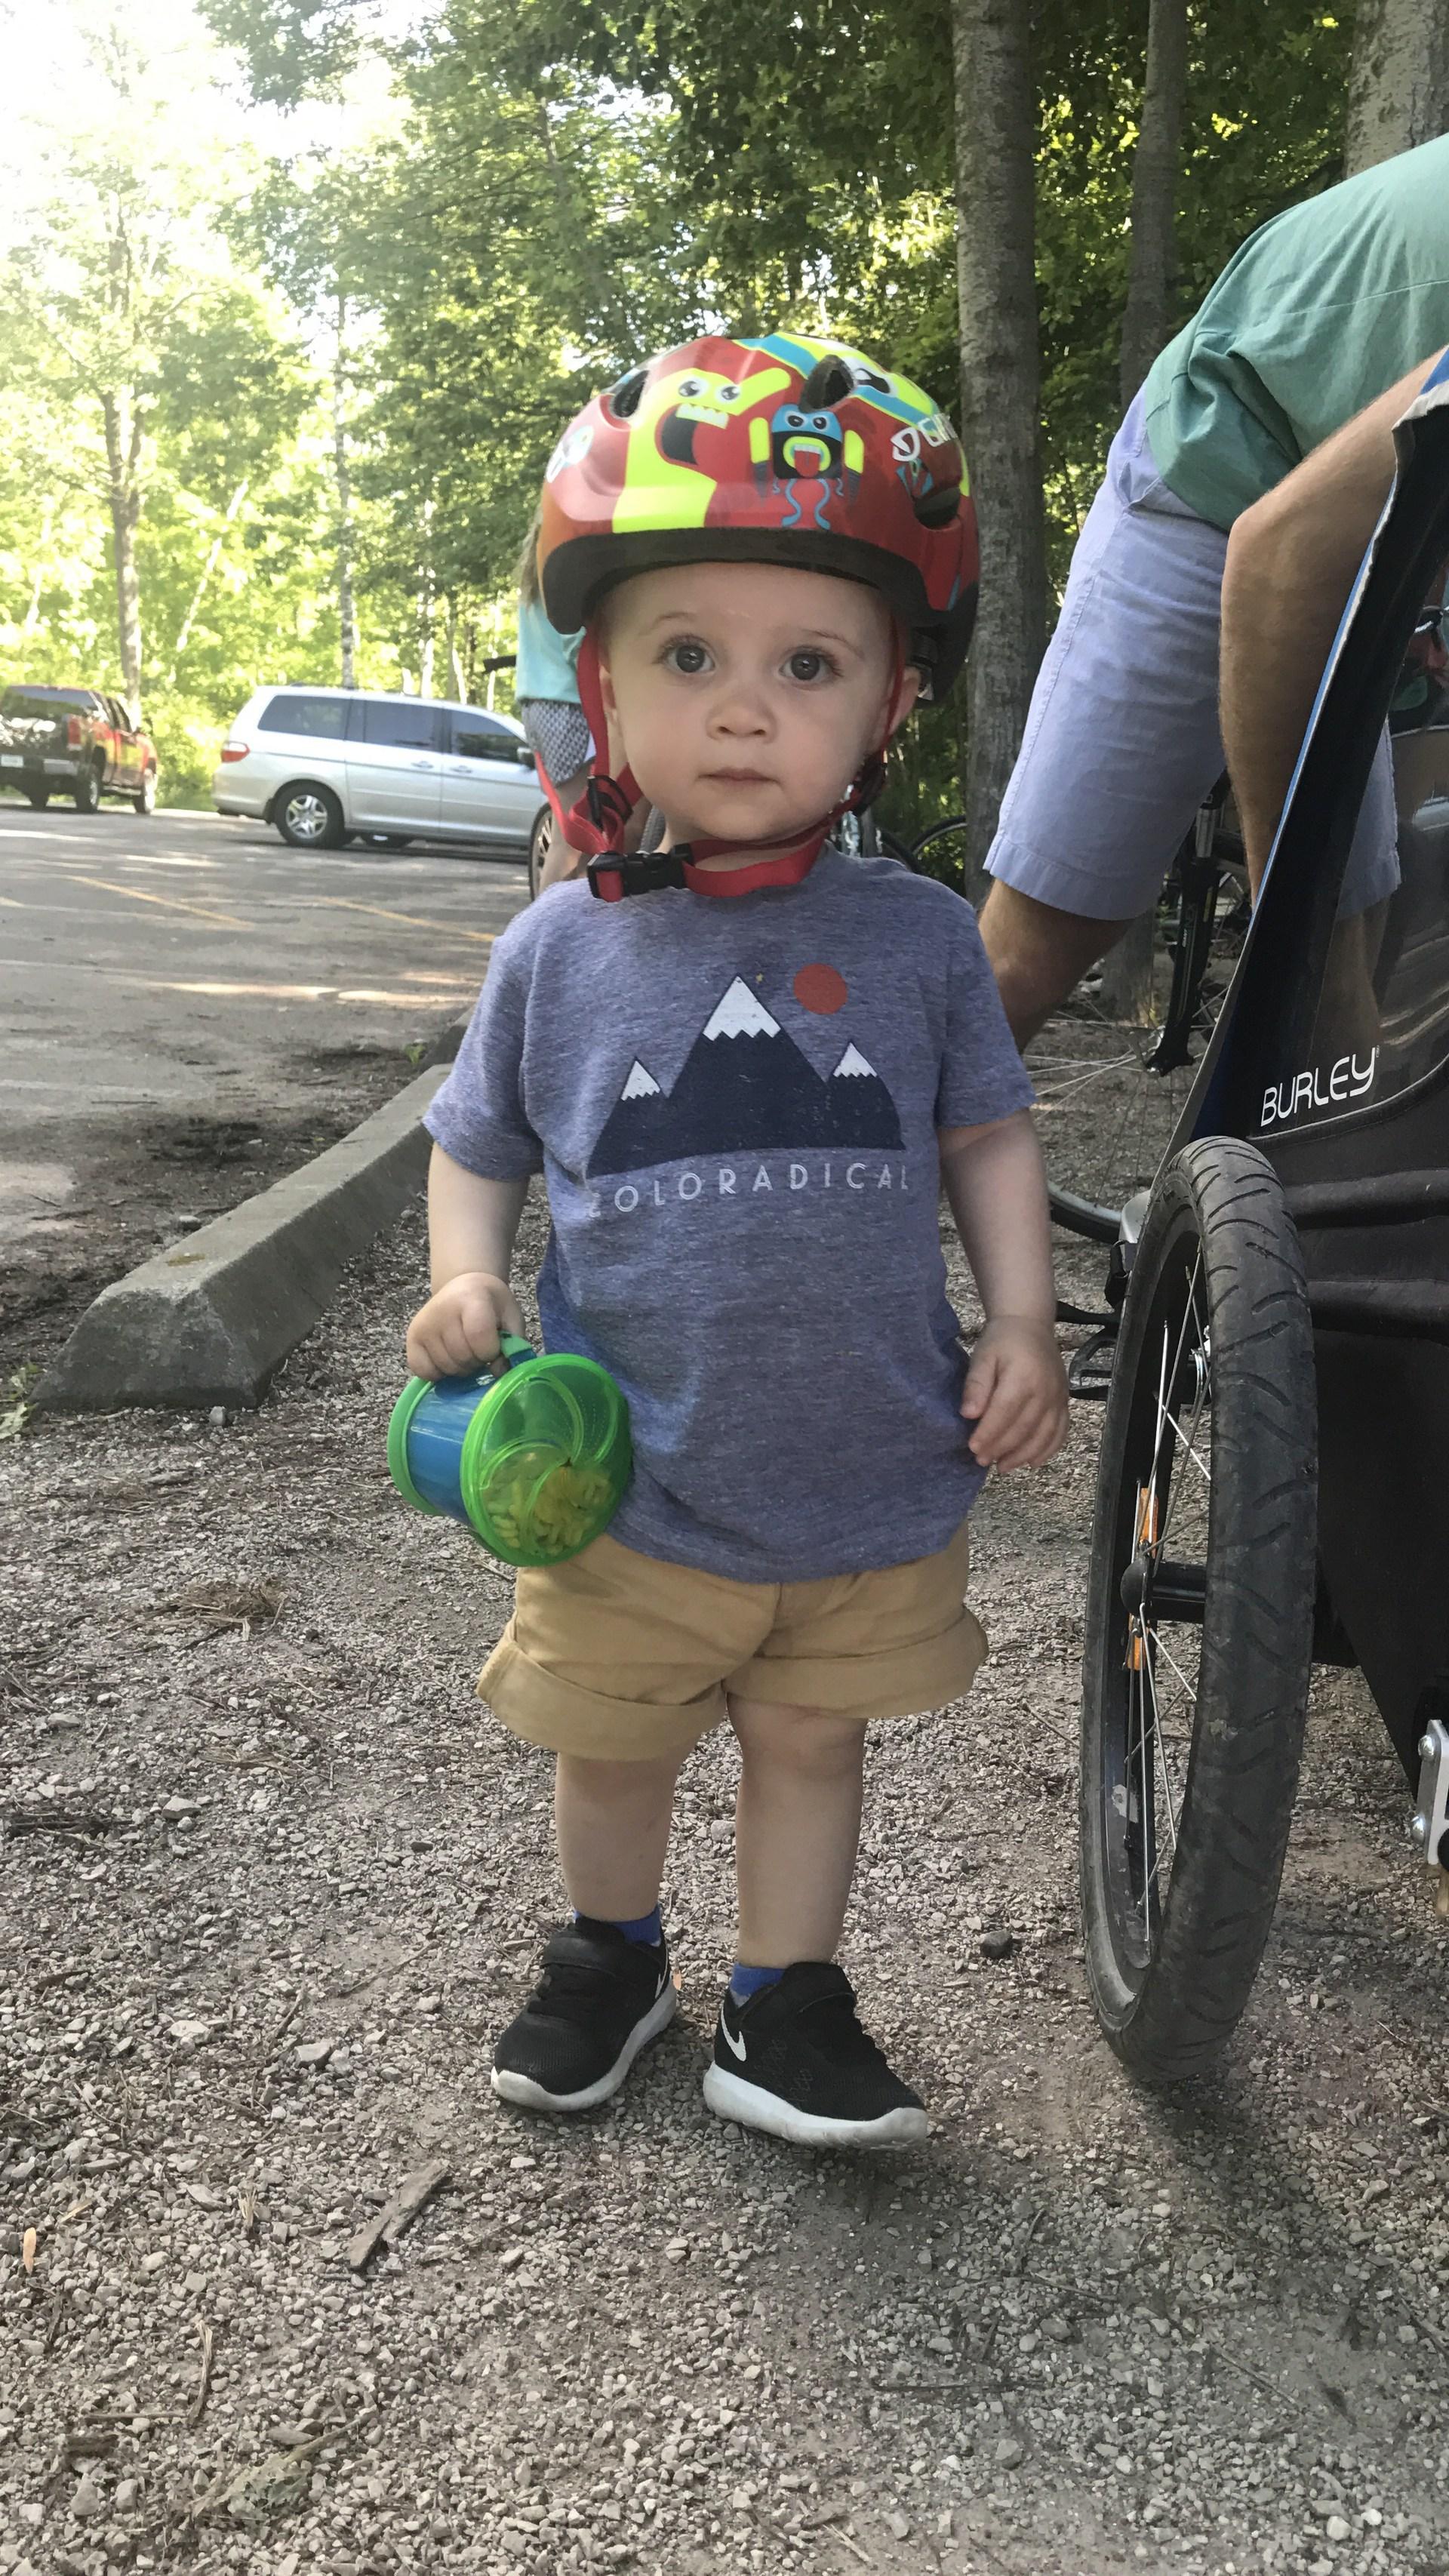 Jack's first bike ride!